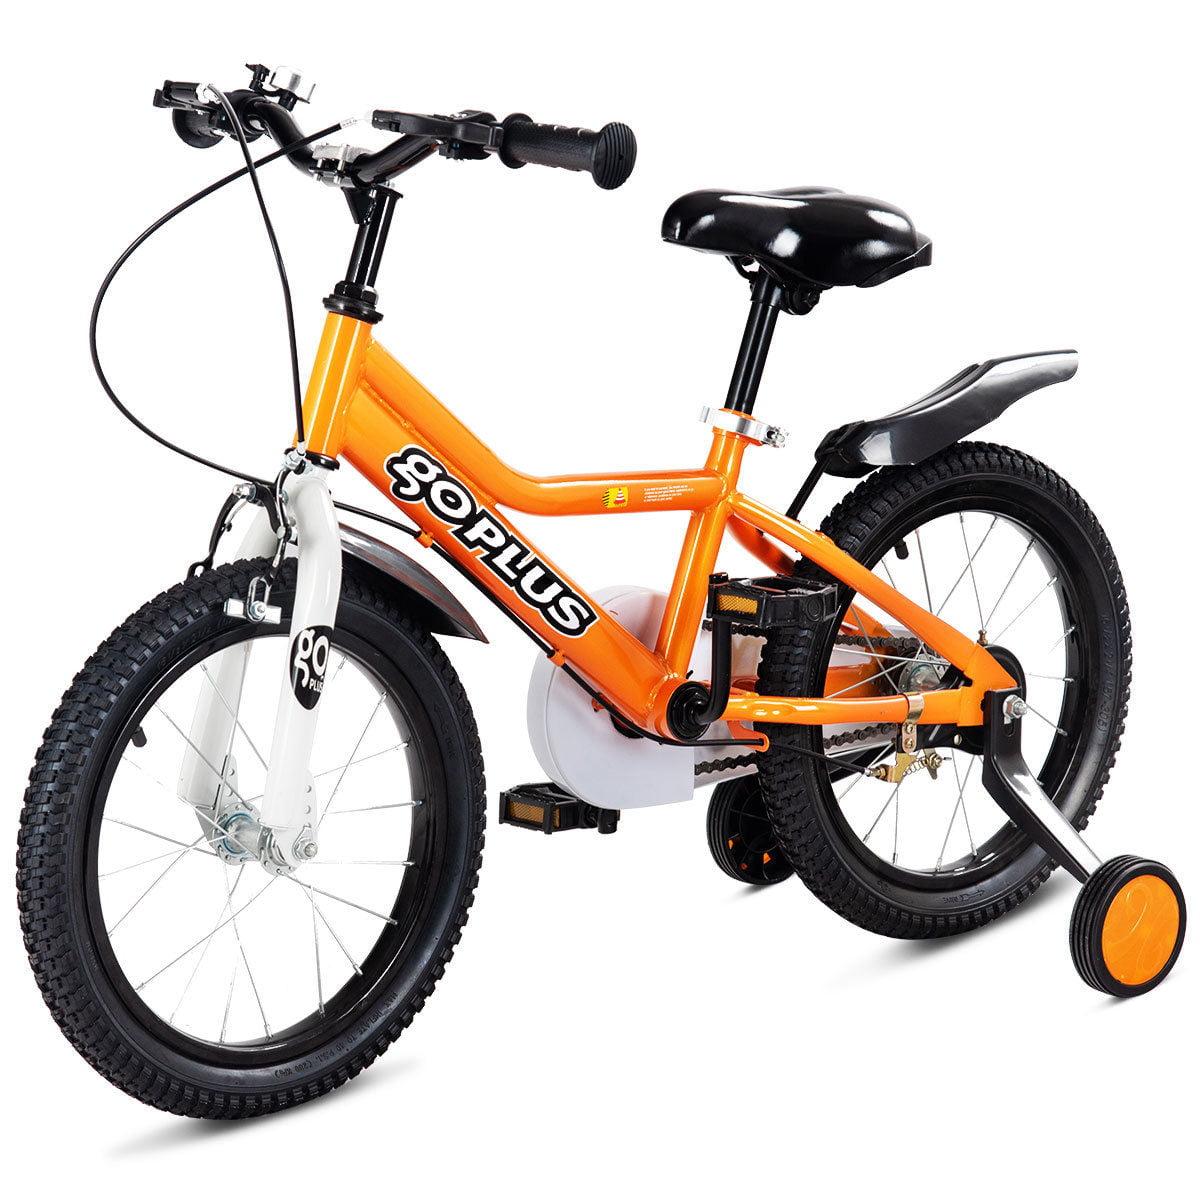 Goplus 12'' Kids Bicycle Outdoor Sports Bike W/ Training Wheel Brakes Boys Girls Cycling